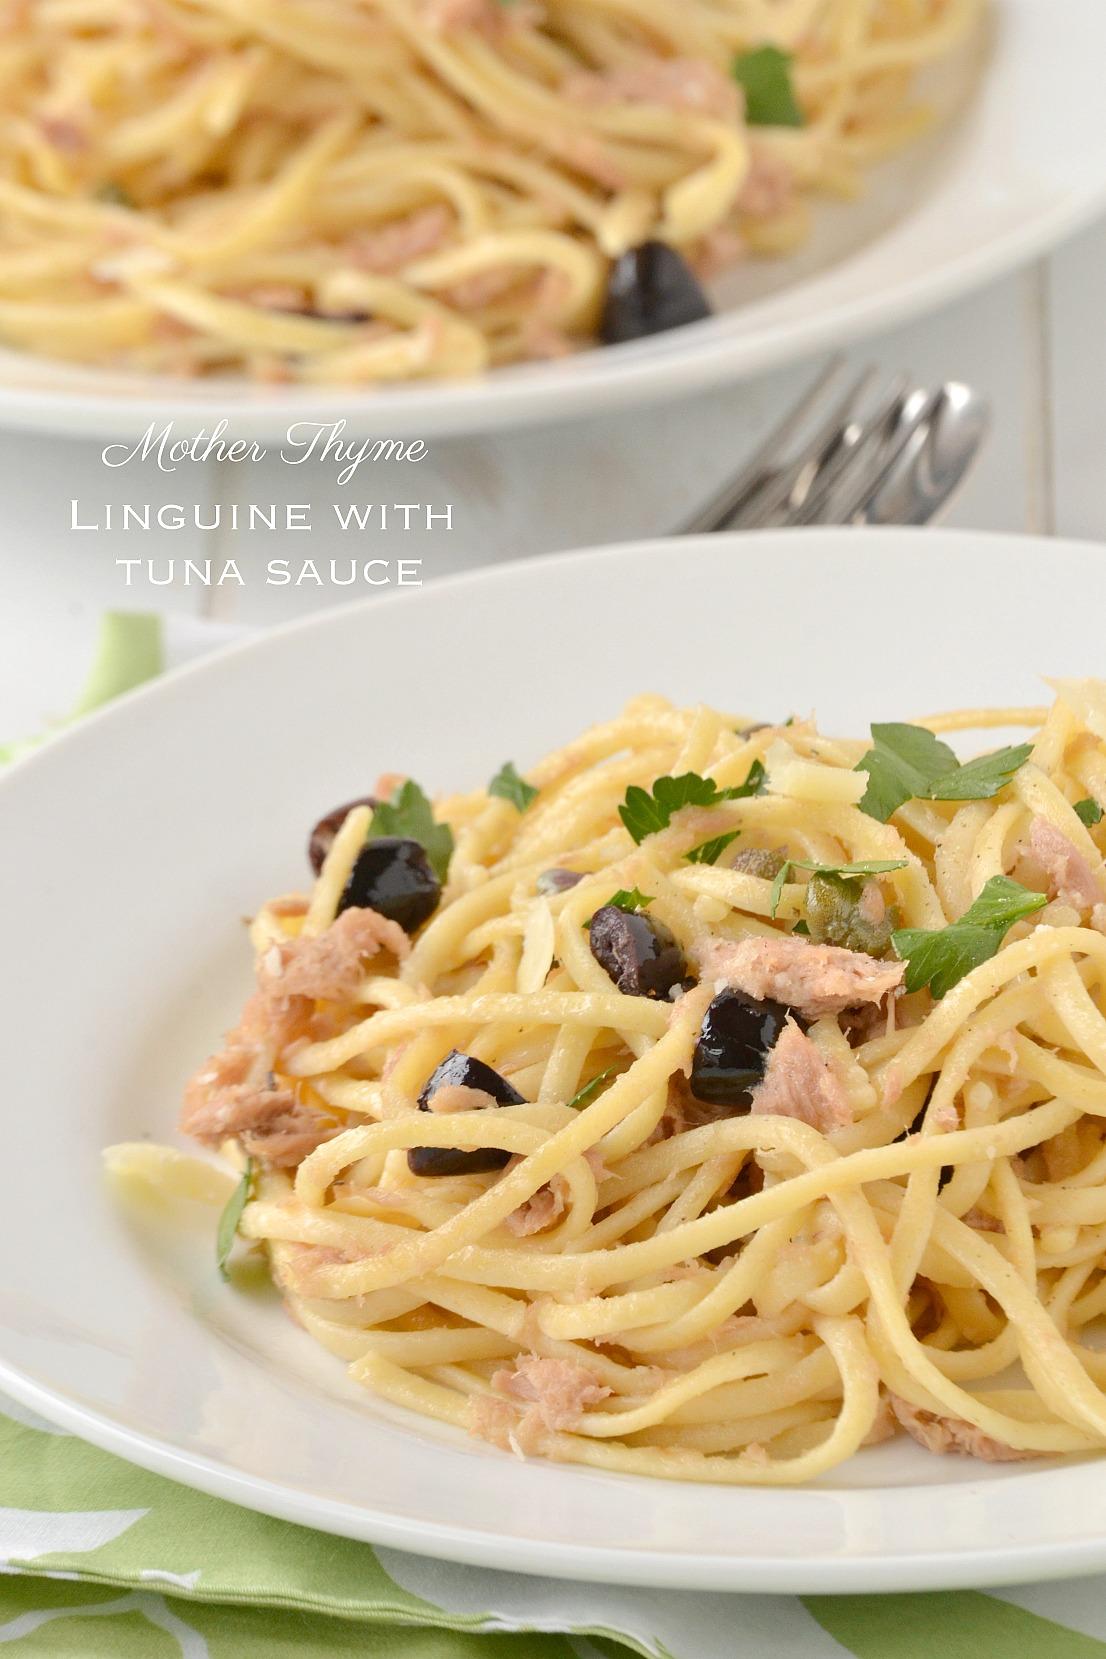 Linguine with Tuna Sauce